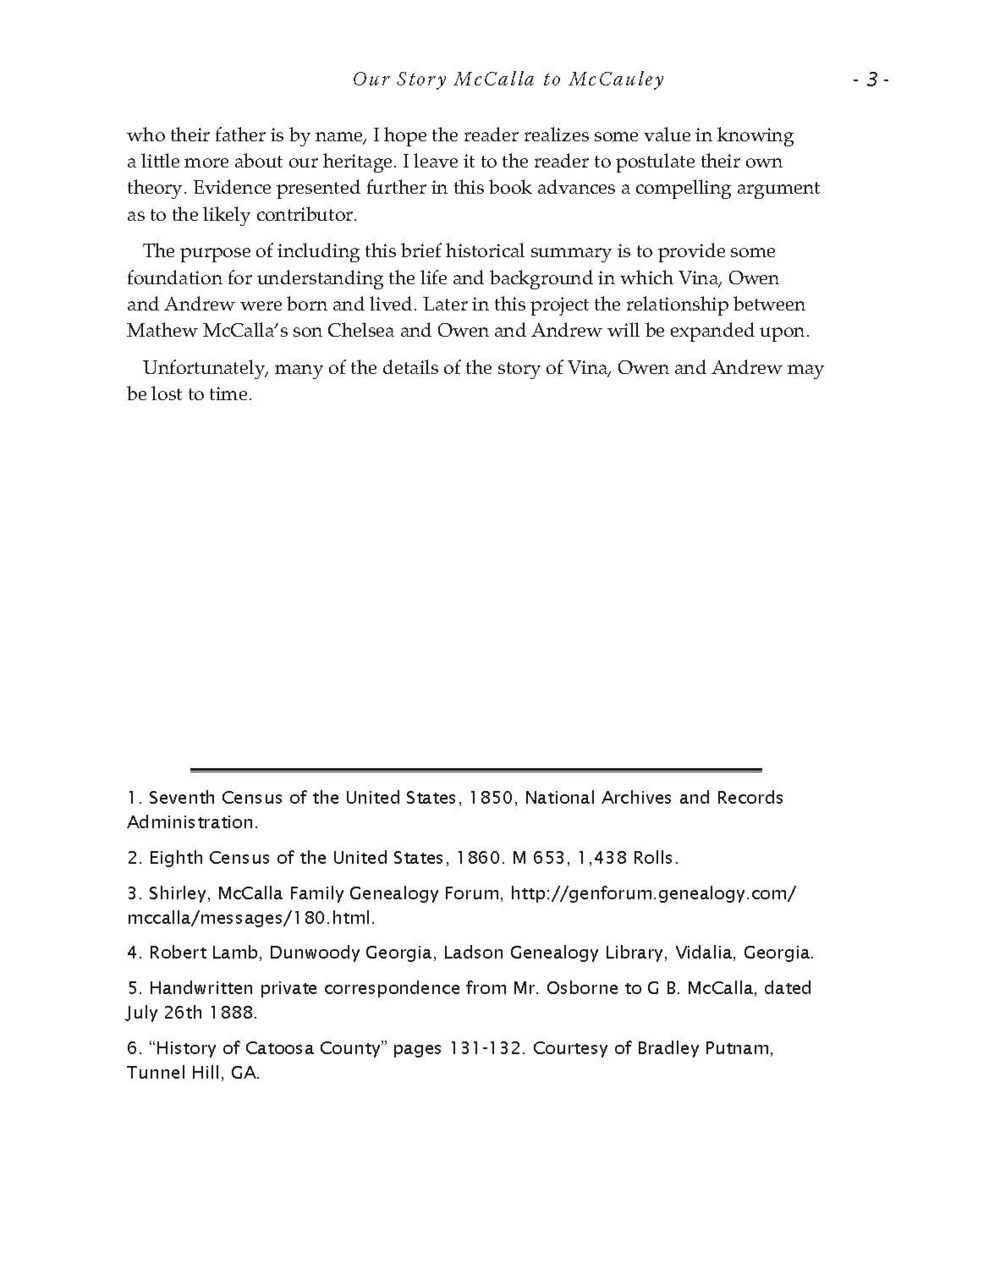 binder2_page_12.jpg